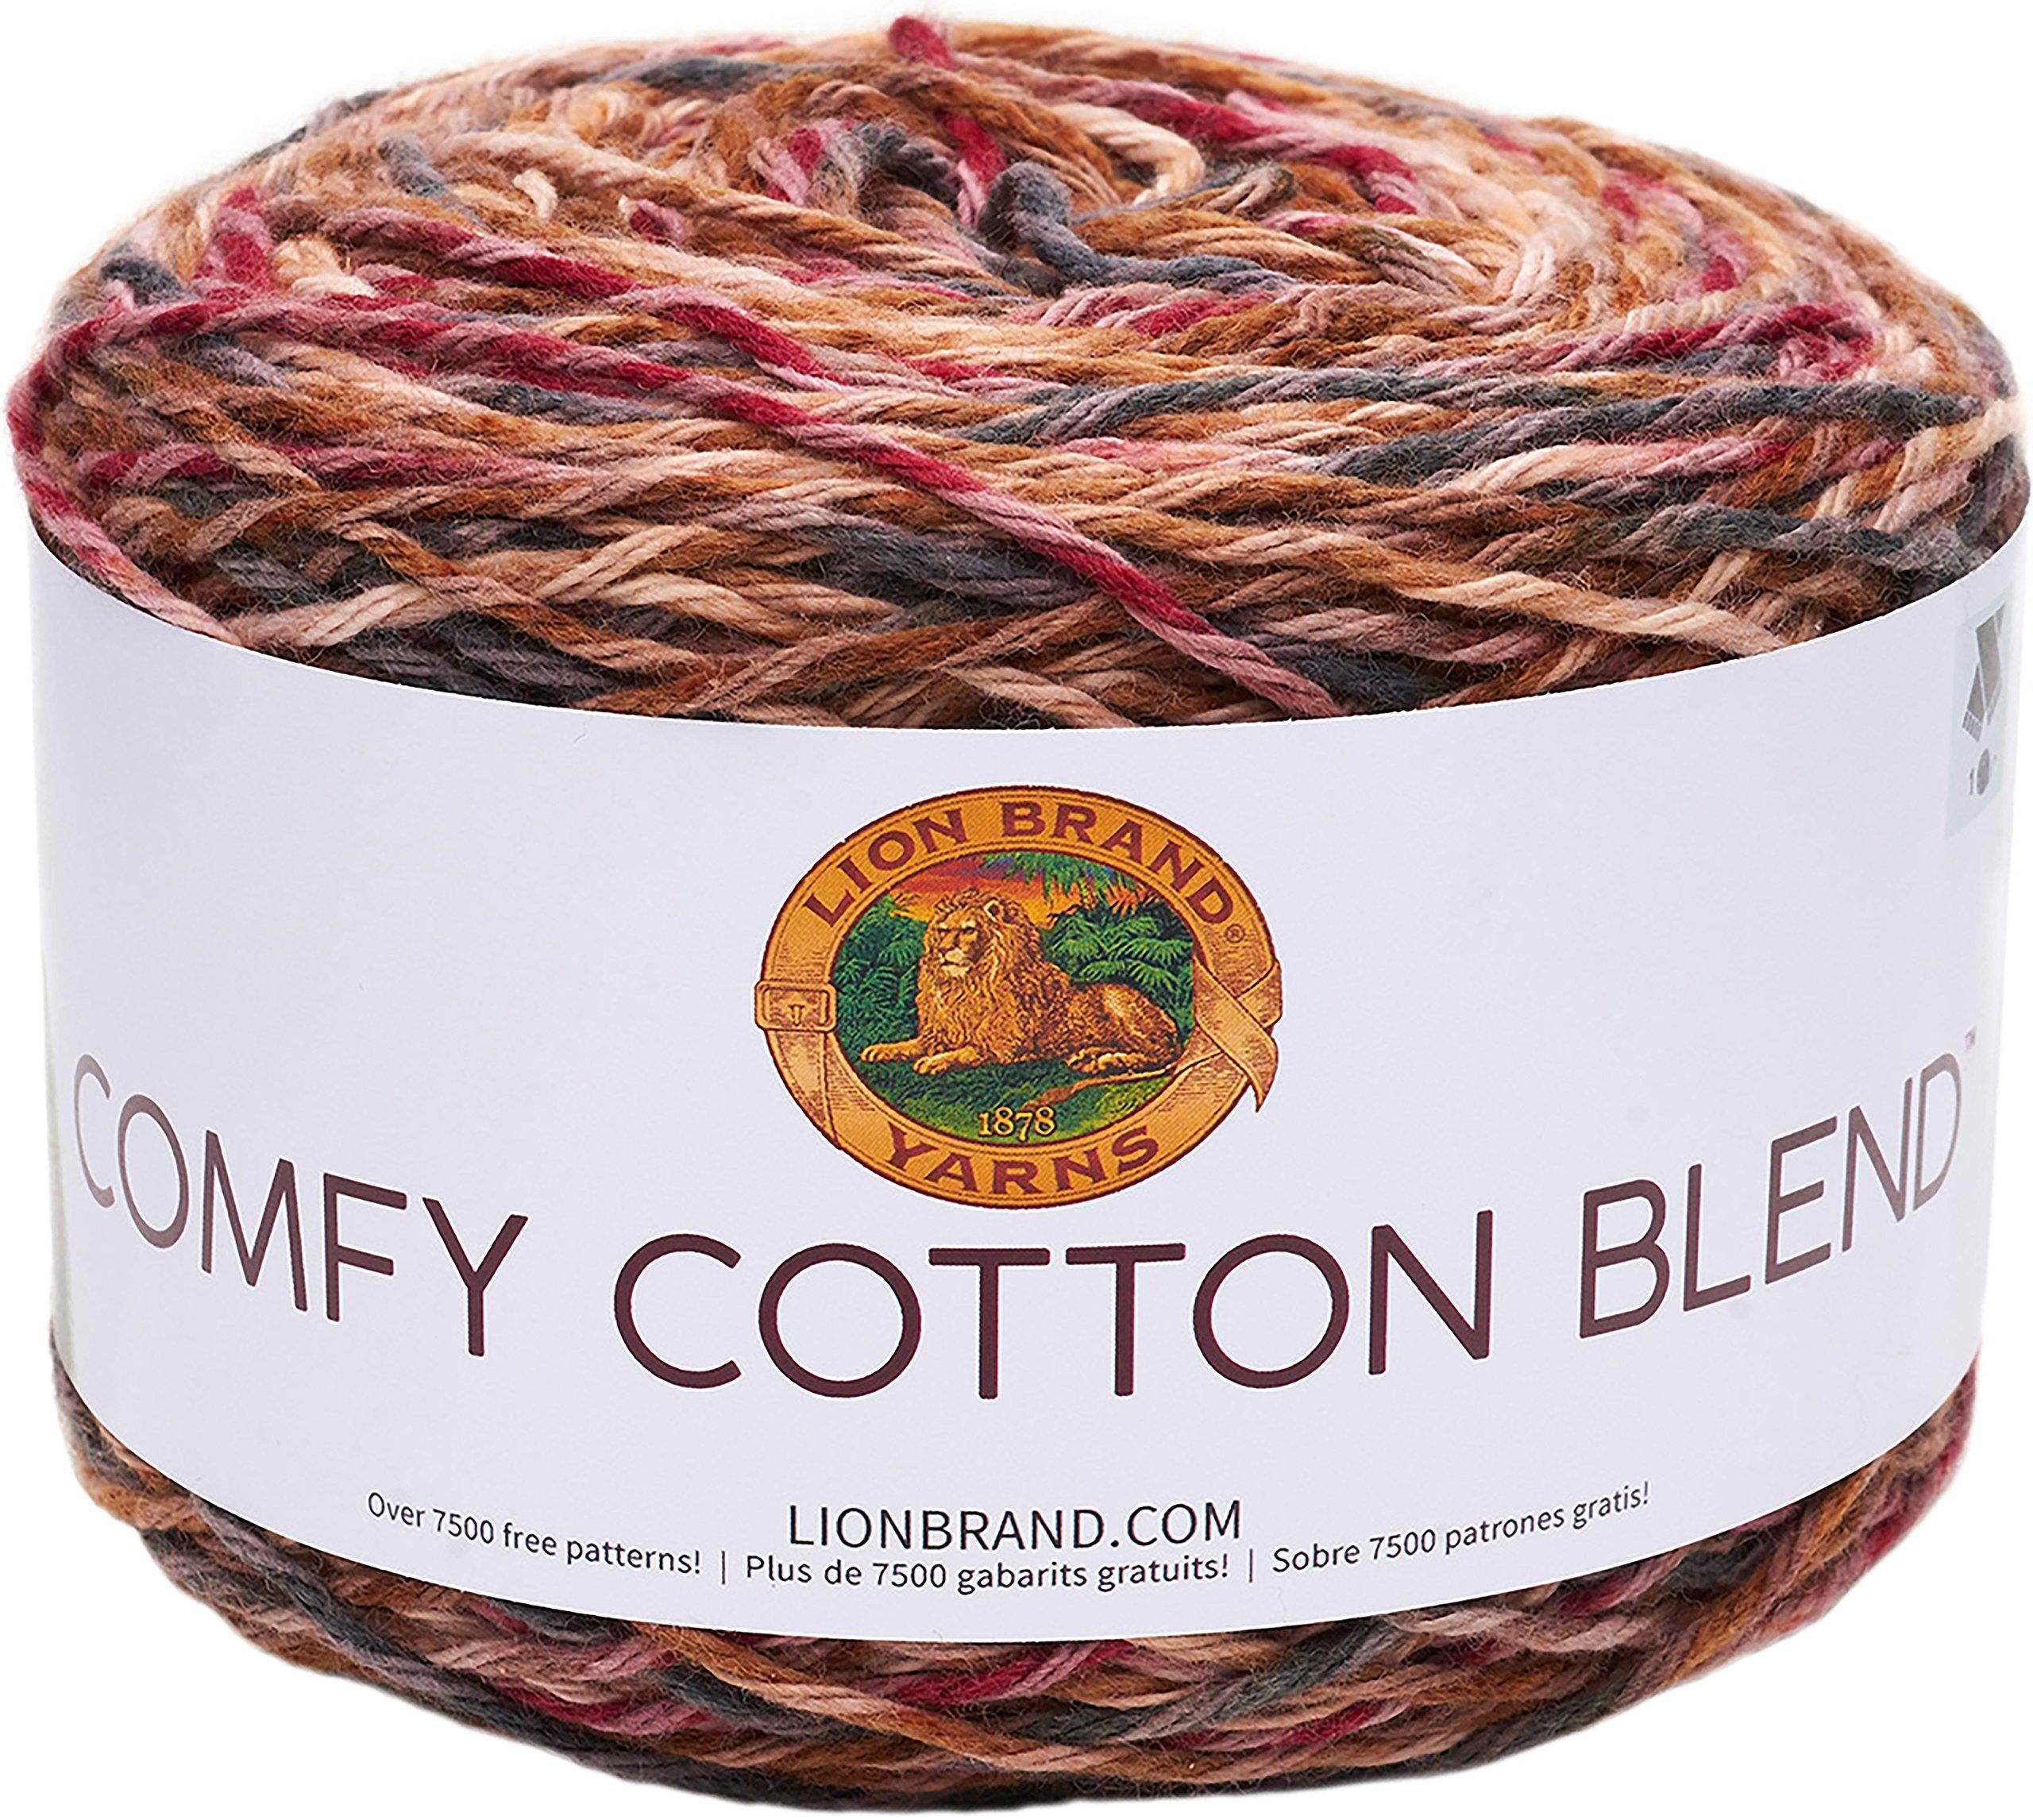 Lion Brand Yarn Comfy Cotton Blend Yarn, Fireside